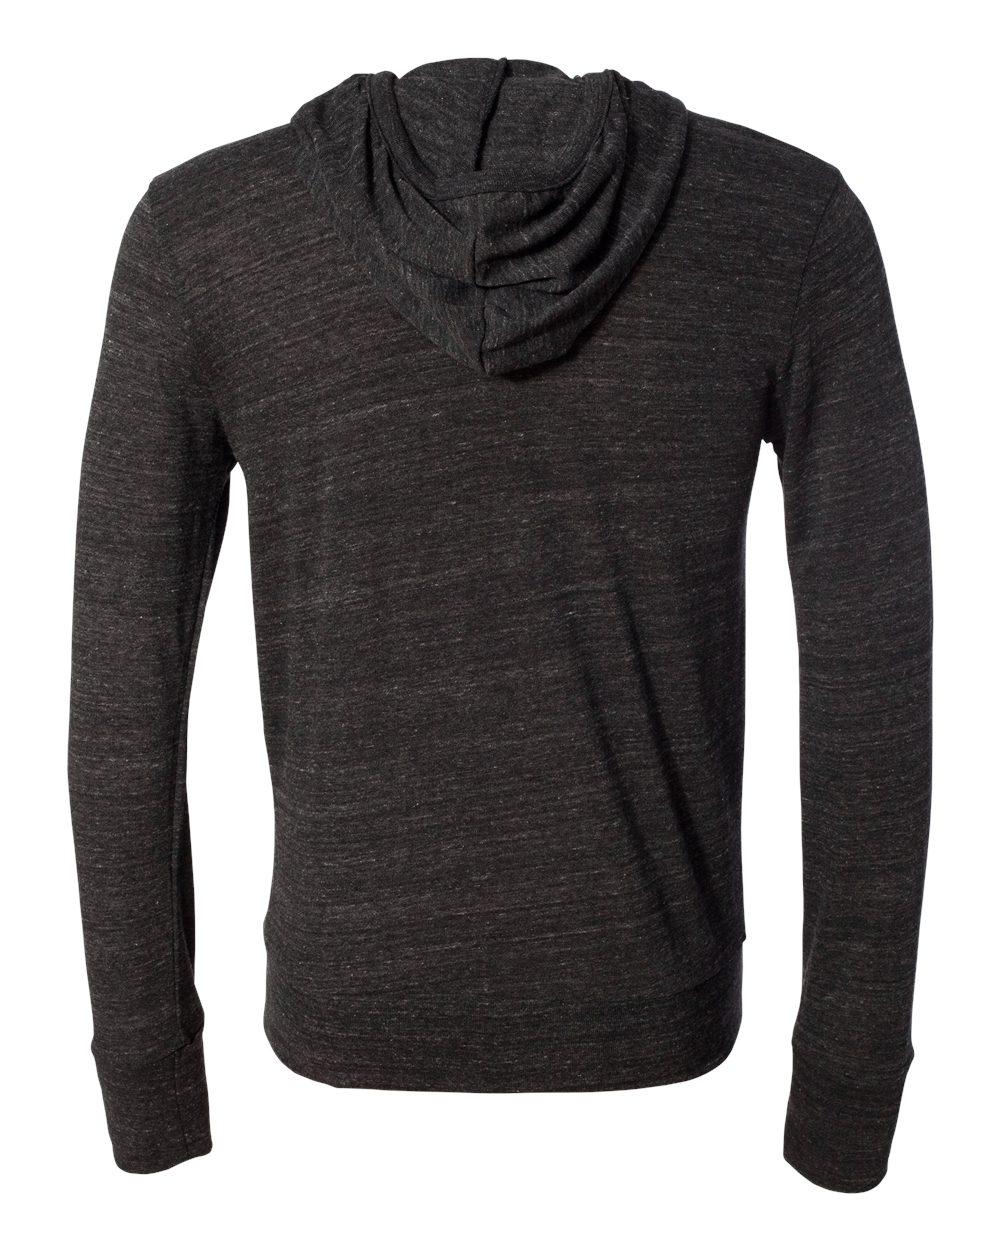 Alternative-Mens-Eco-Jersey-Hooded-Full-Zip-T-Shirt-Blank-Plain-1970e1-up-to-3XL miniature 7